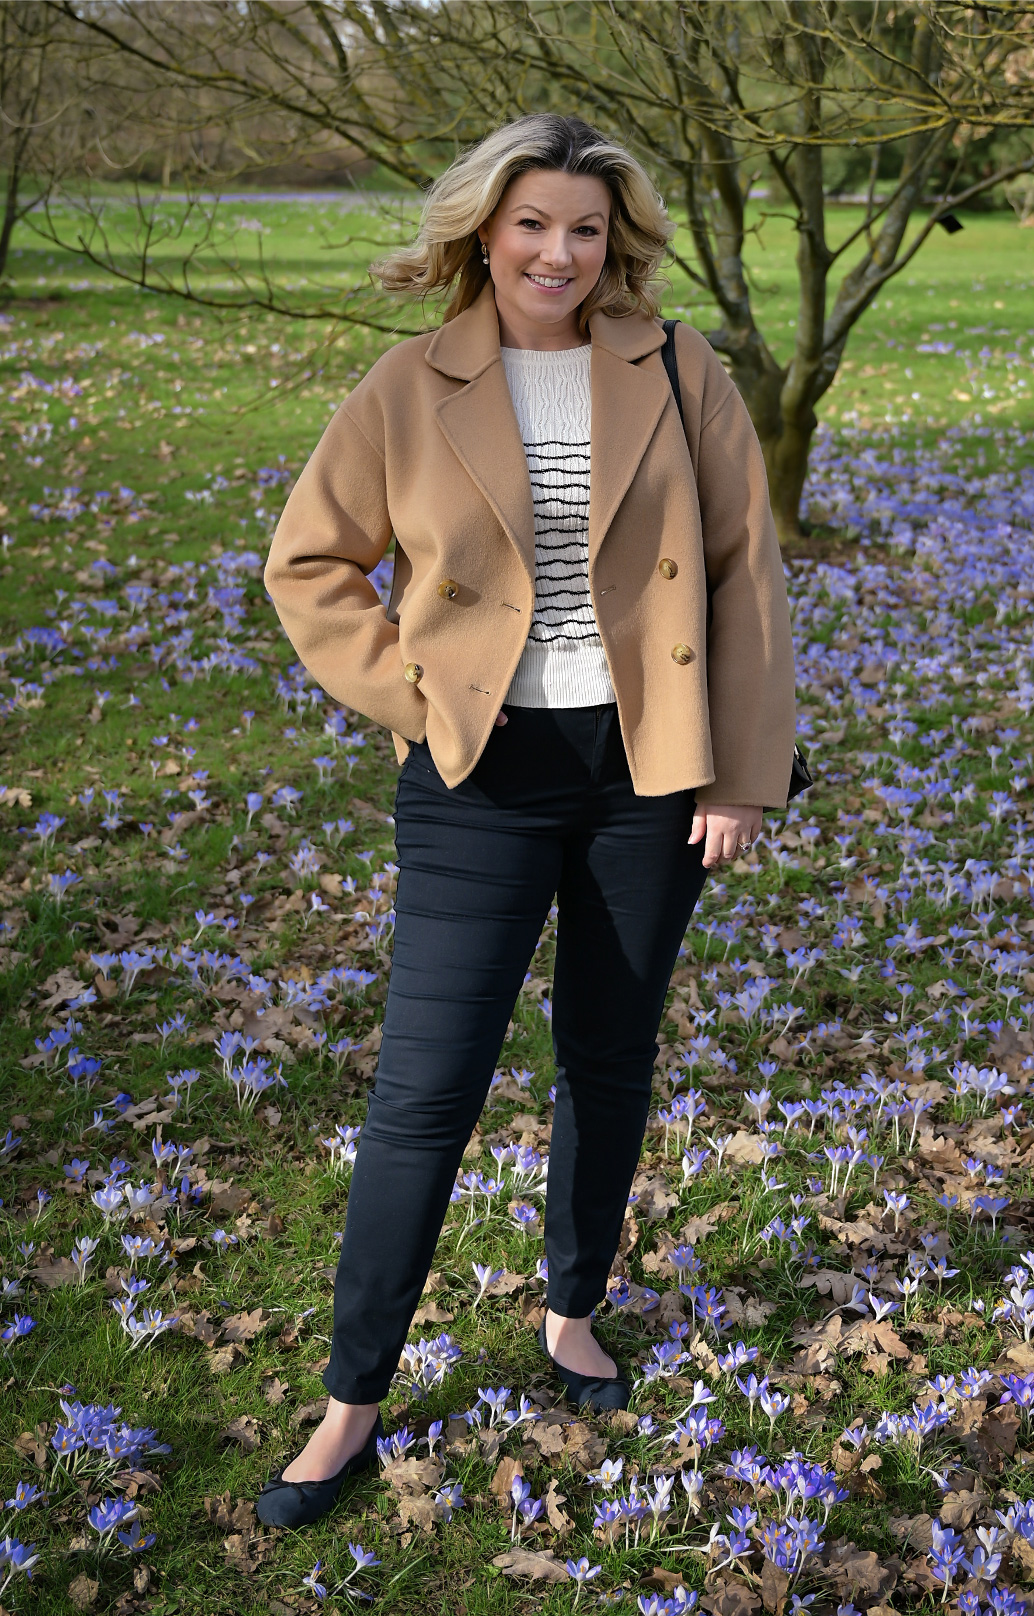 Singer Natalie Rushdie photographed on a walk wearing Hobbs Rosanna camel jacket, Daniella jumper and Gia black jeans.